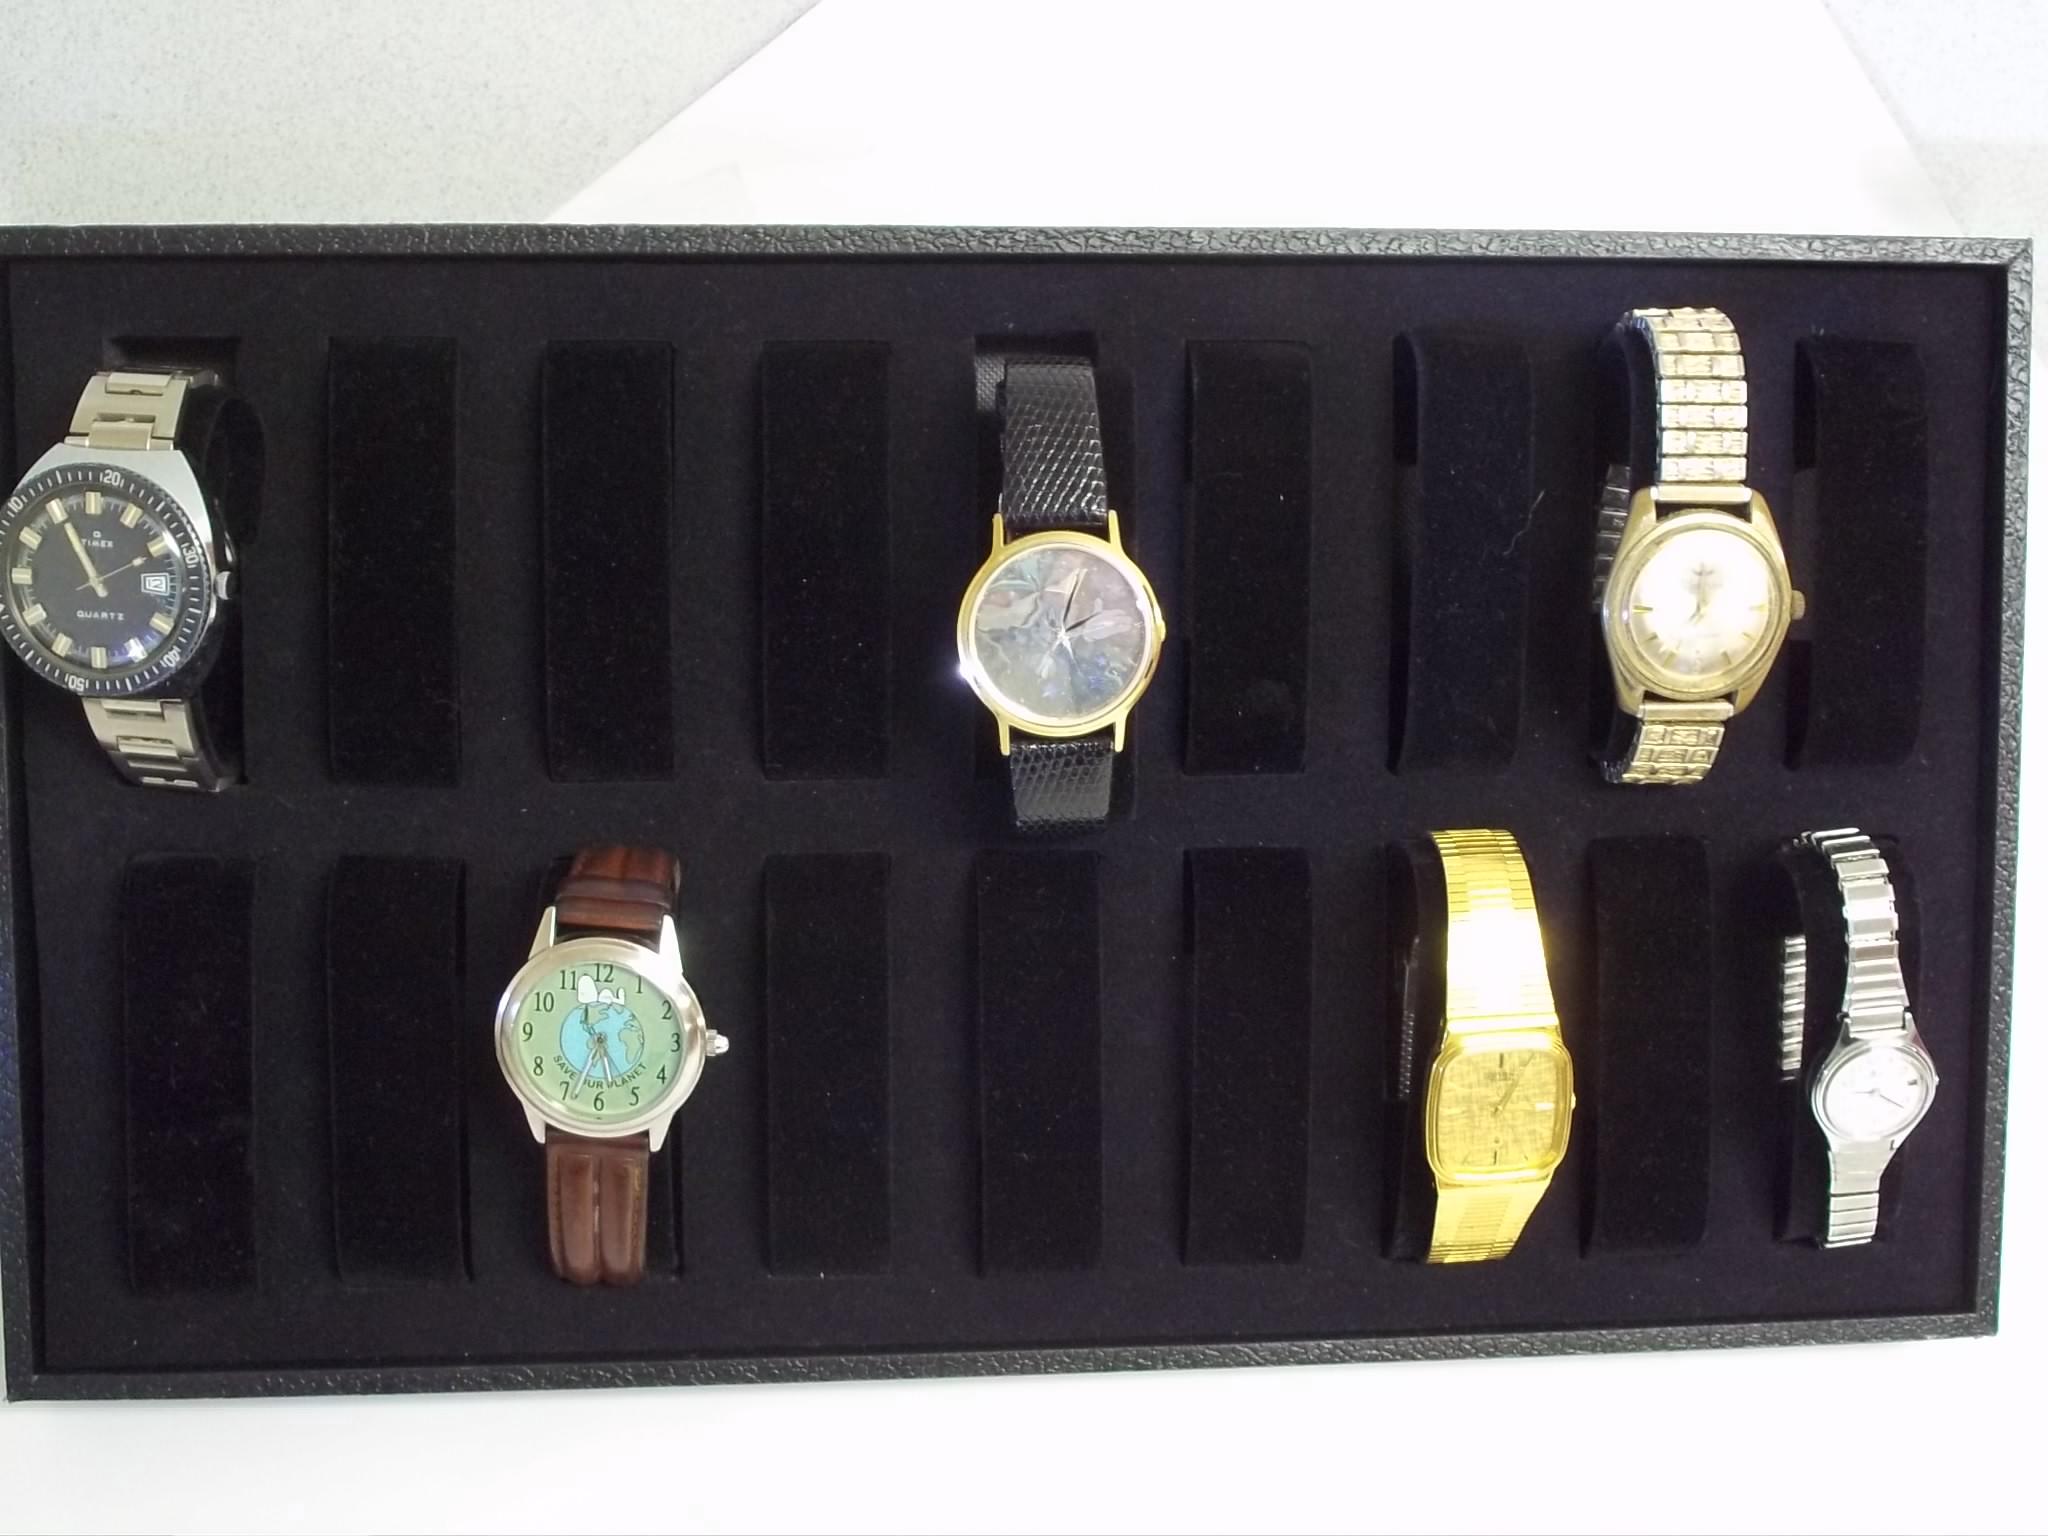 BVWT18 18 Slot Watch Display Tray